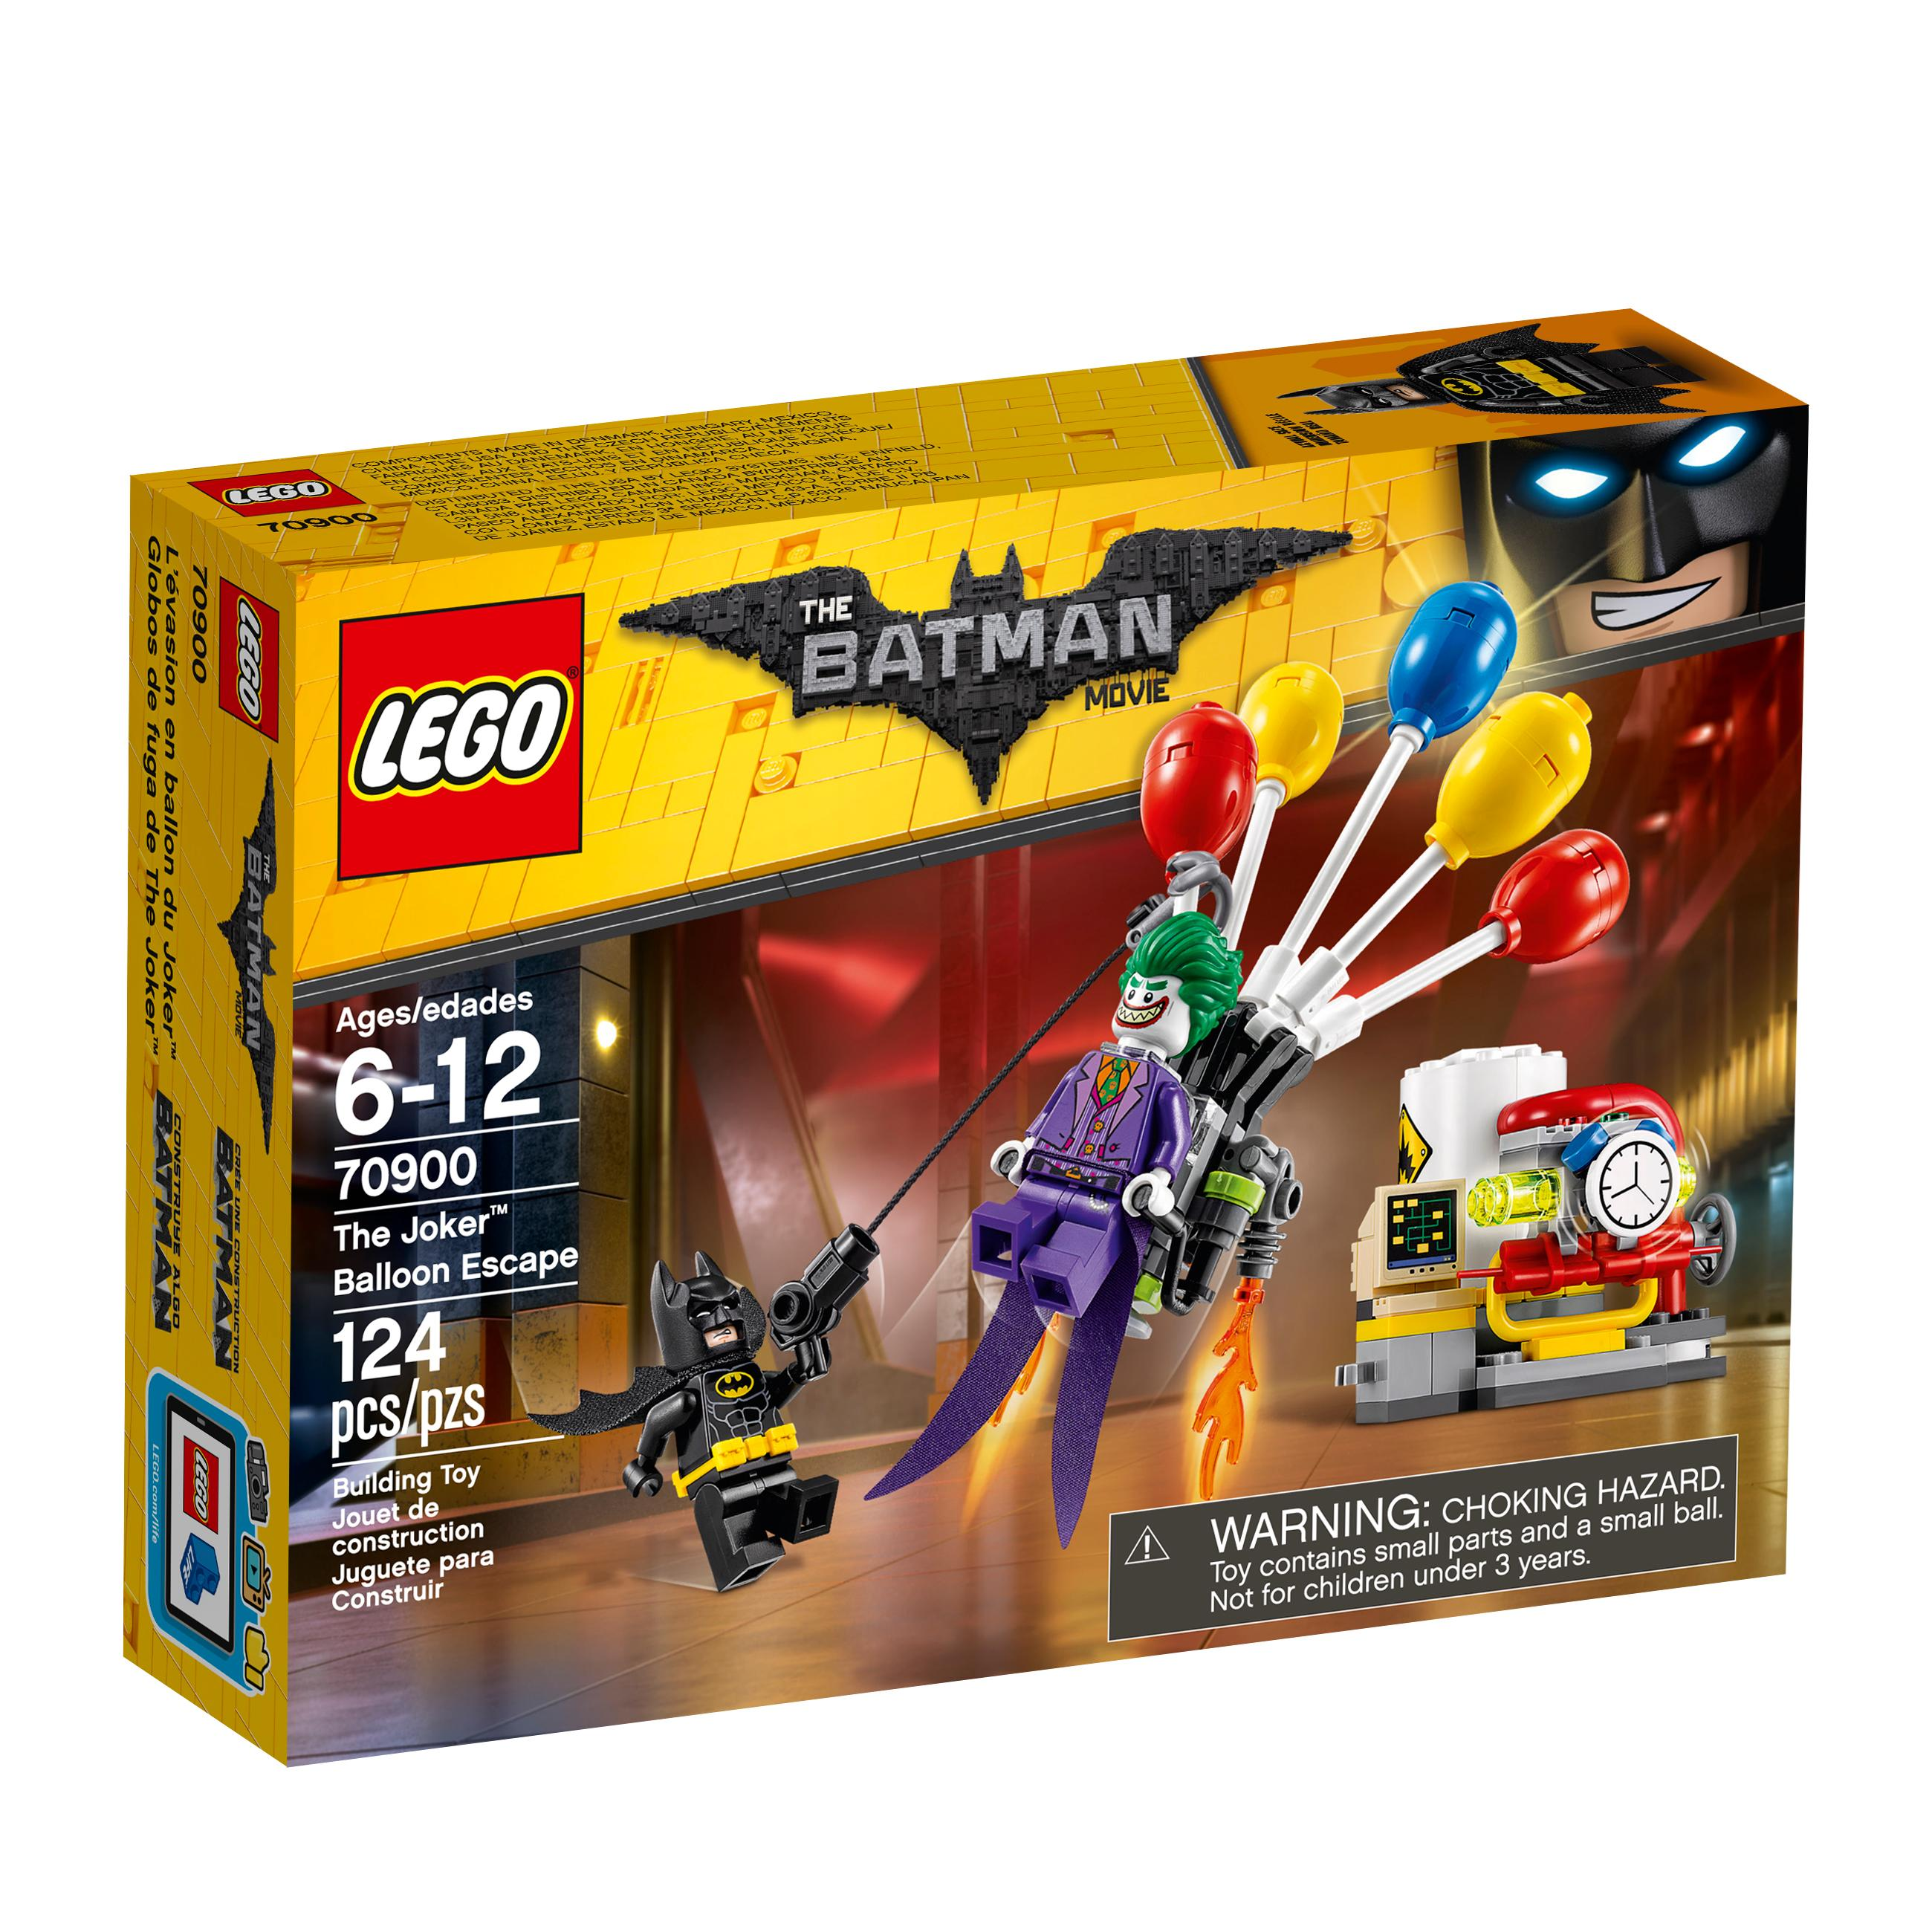 Lego Movie Toys : Amazon the lego batman movie joker balloon escape